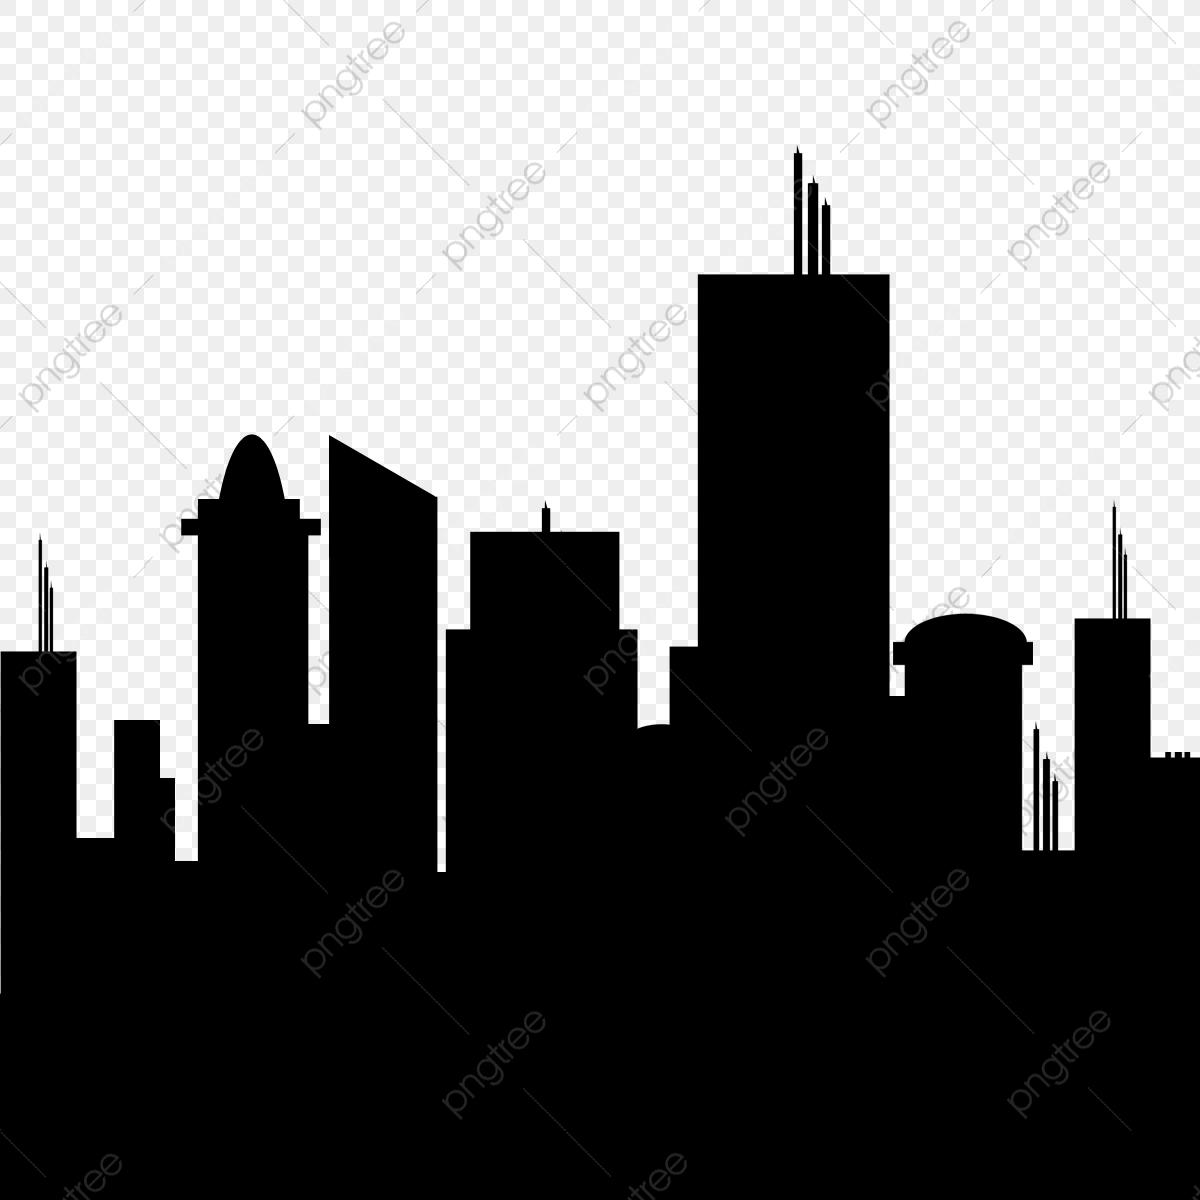 Buildings Silhouette, Buildings, Silhouette PNG Transparent Clipart.